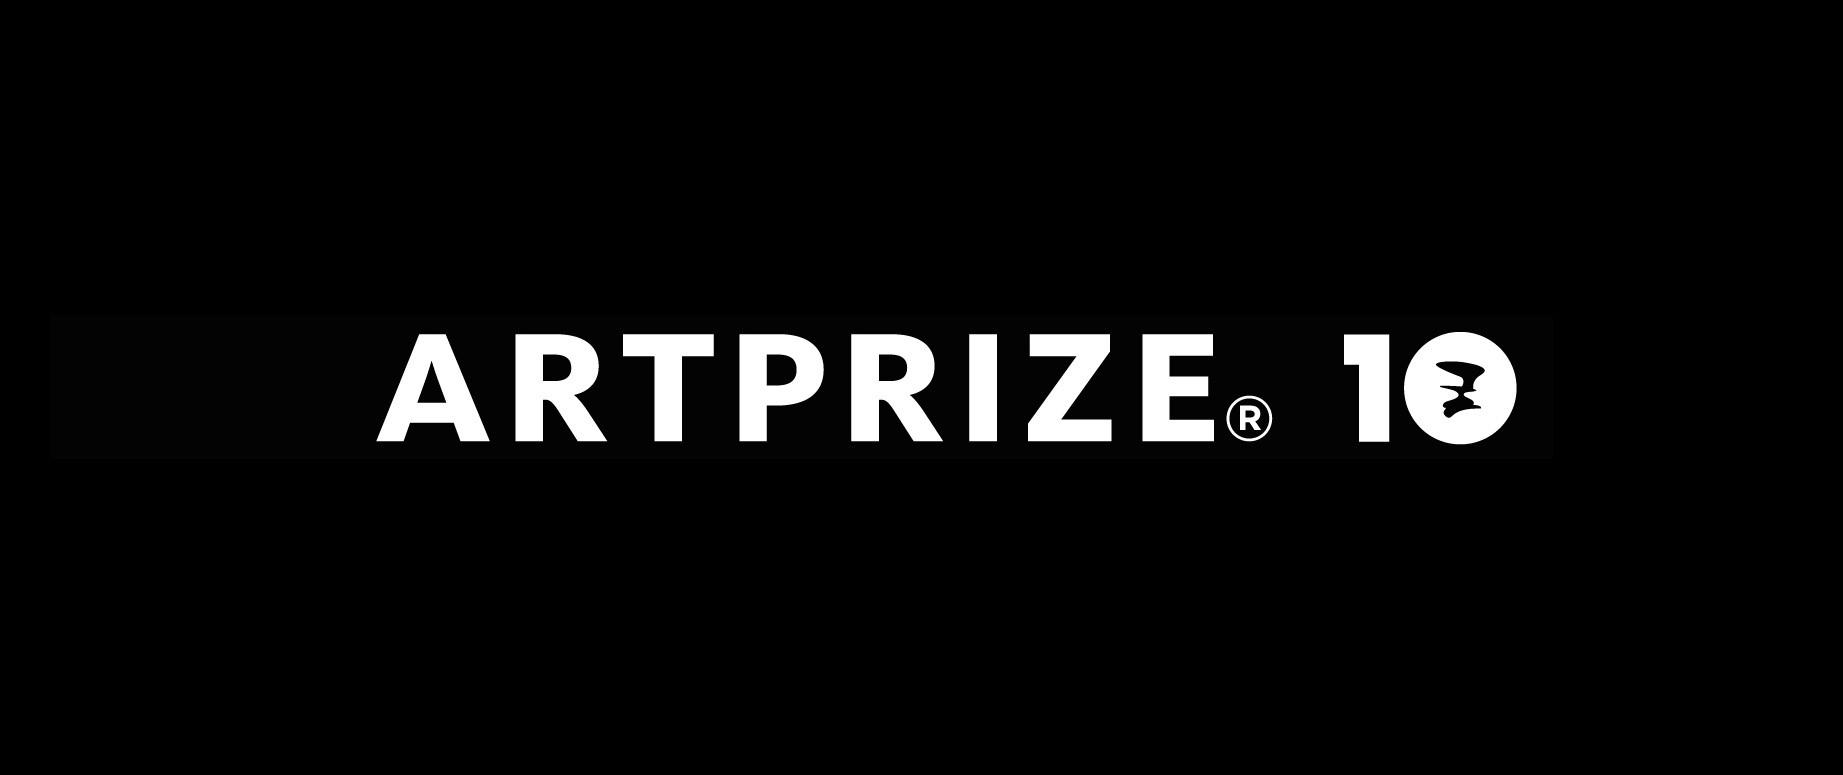 ArtPrize | LinkedIn